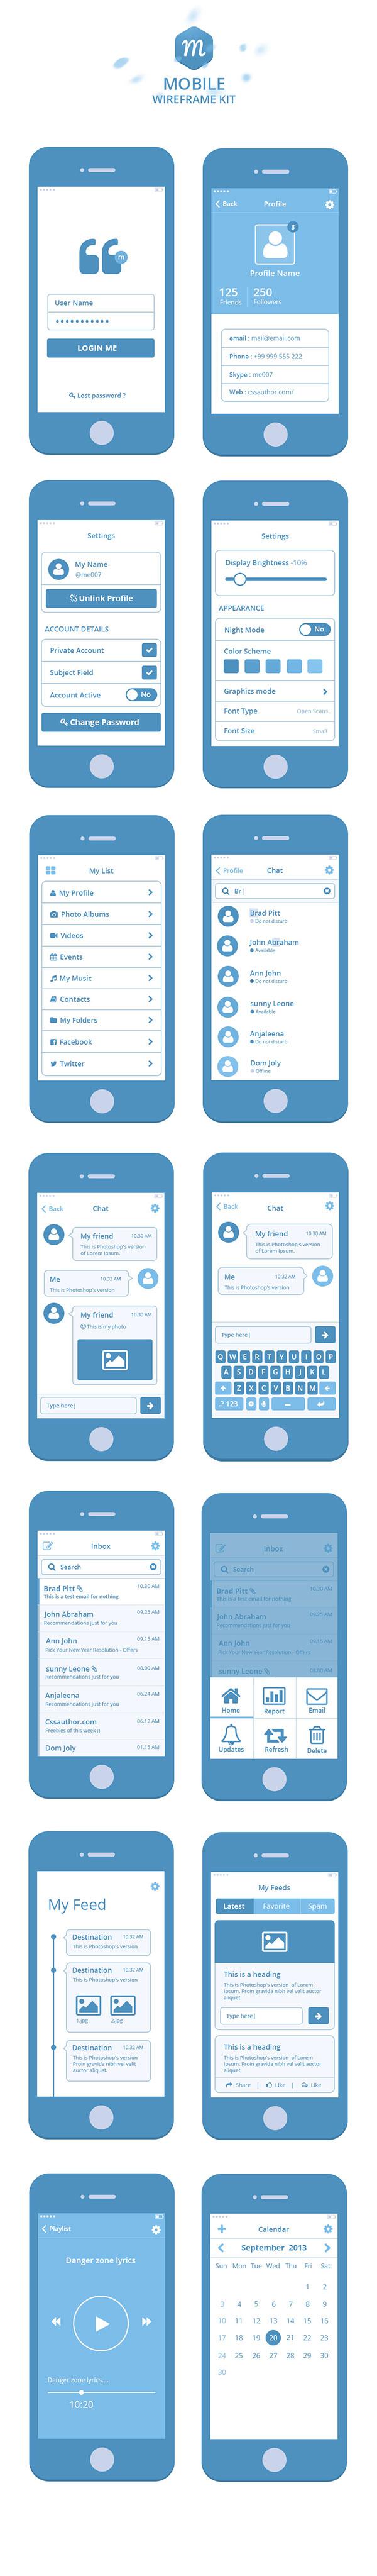 #webdesign #it #web #design #layout #userinterface #website #webdesign #pixpivot #pixpivot.com #ui_kit #download #free_psd #flat #round #square #icons #iphone #web app #device_mockup Mobile Wireframe Kit psd wireframe